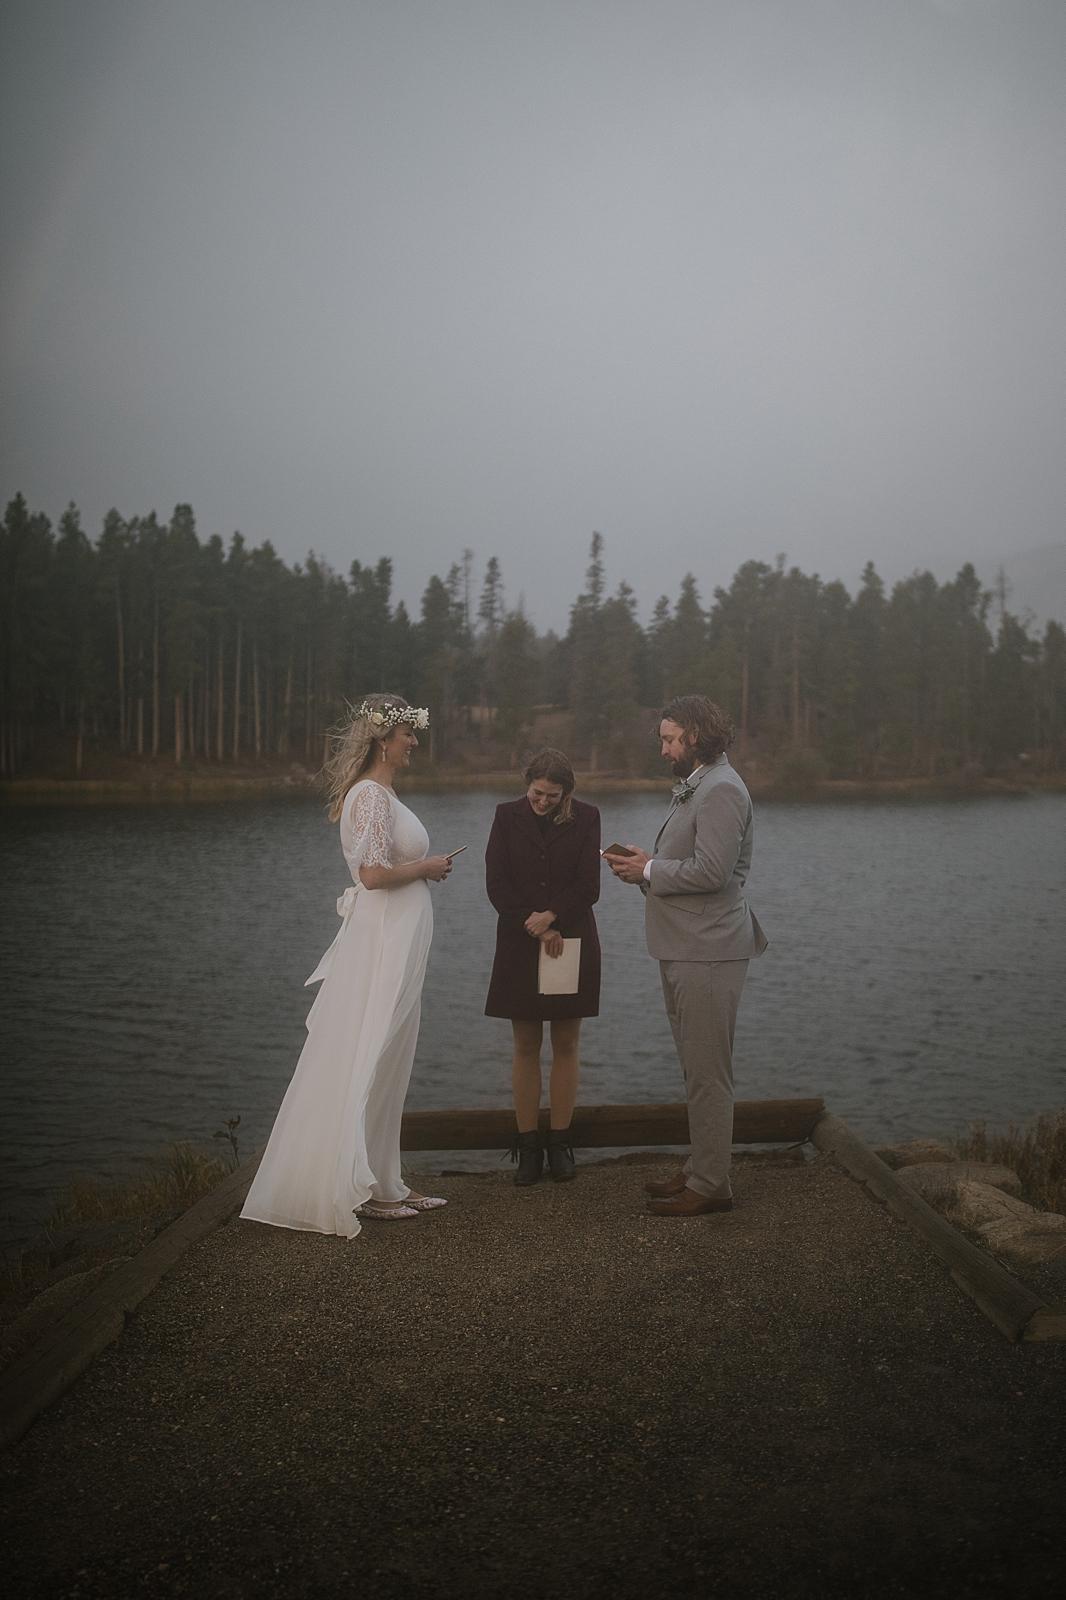 bride and groom in the rain, sprague lake dock elopement, sunrise elopement, colorado elopement, sprague lake elopement, rocky mountain national park elopement, adventurous colorado hiking elopement